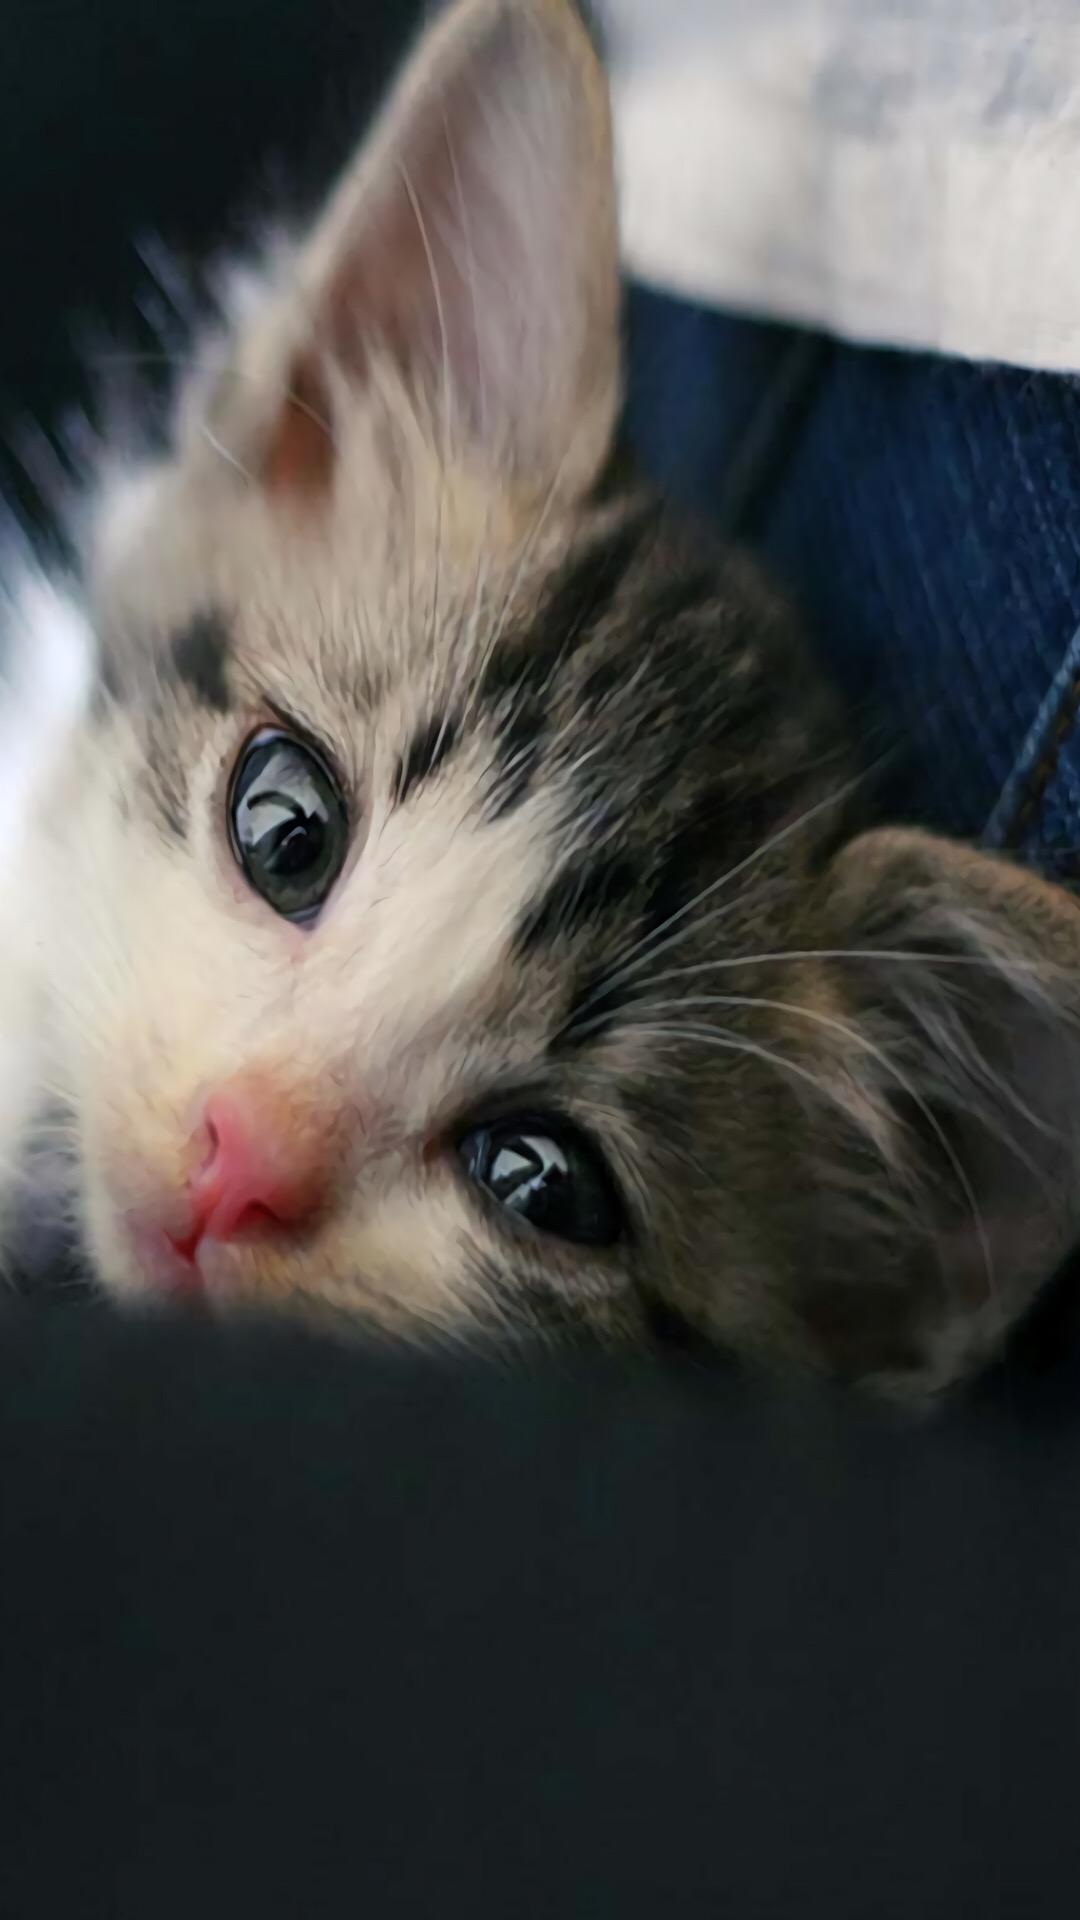 【v粉壁纸】萌宠小猫可爱高清手机壁纸1